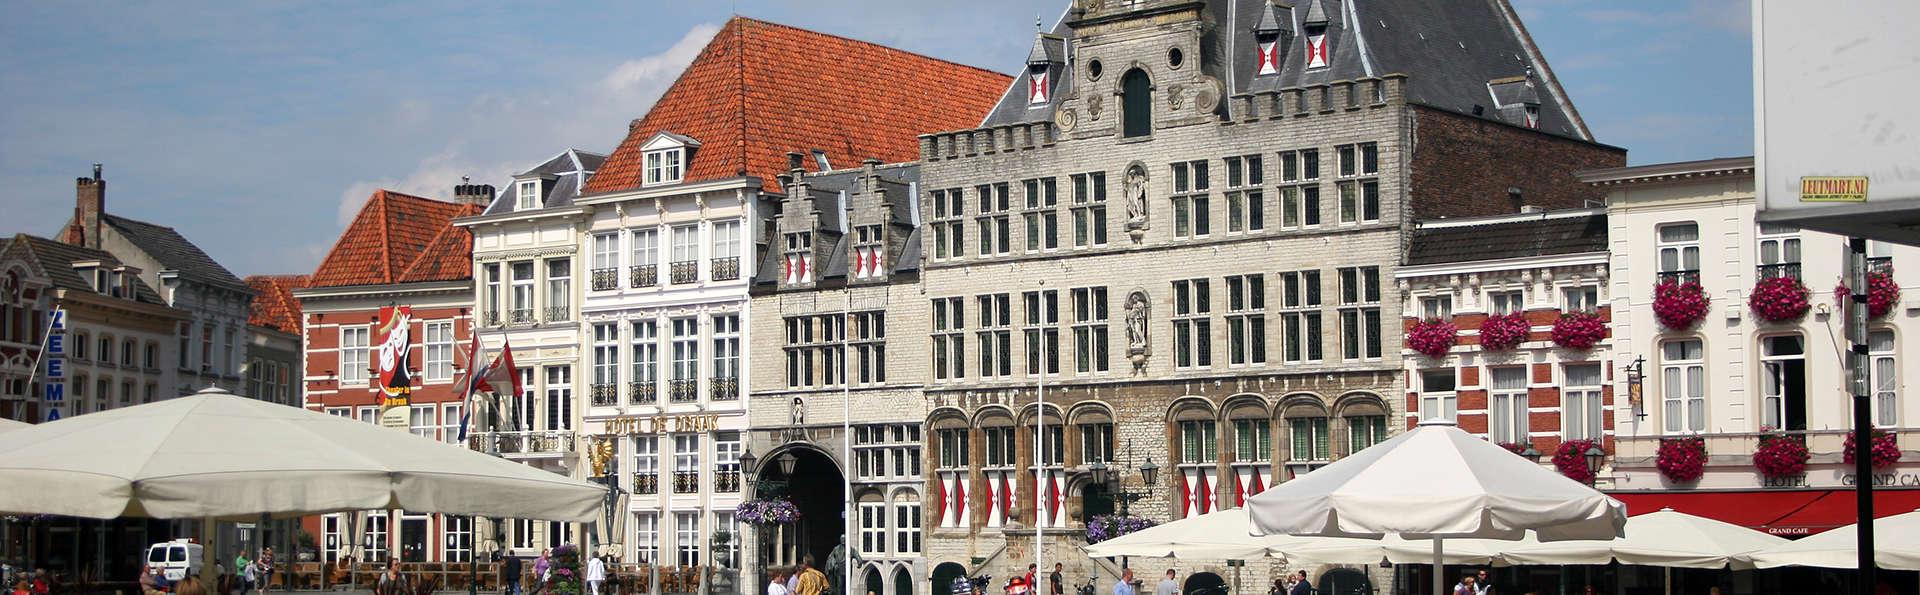 Bastion Hotel Roosendaal - edit_bergen.jpg